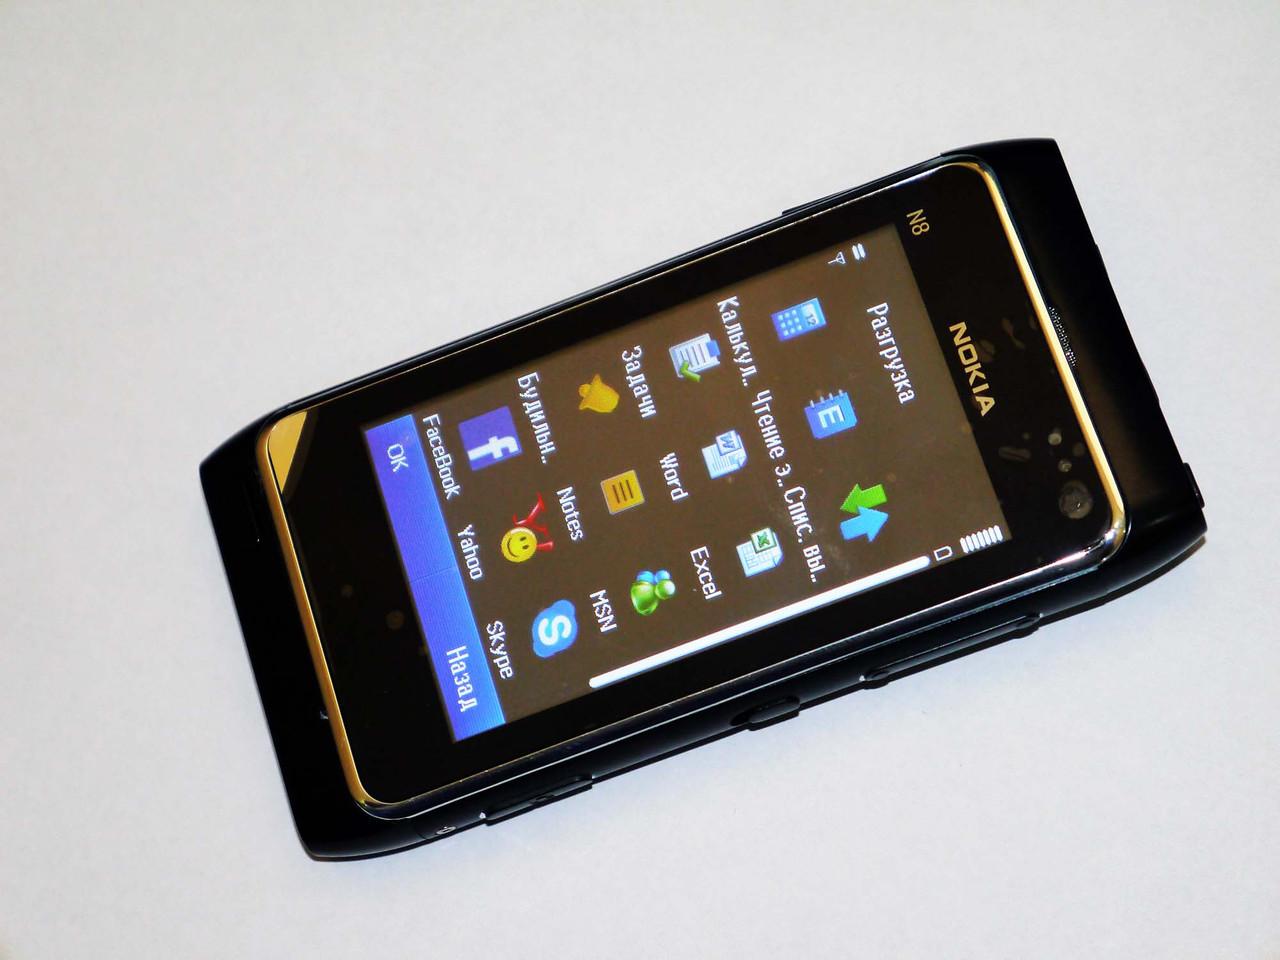 Телефон Nokia N8 - 1Sim+ Металл+ Java+ FM